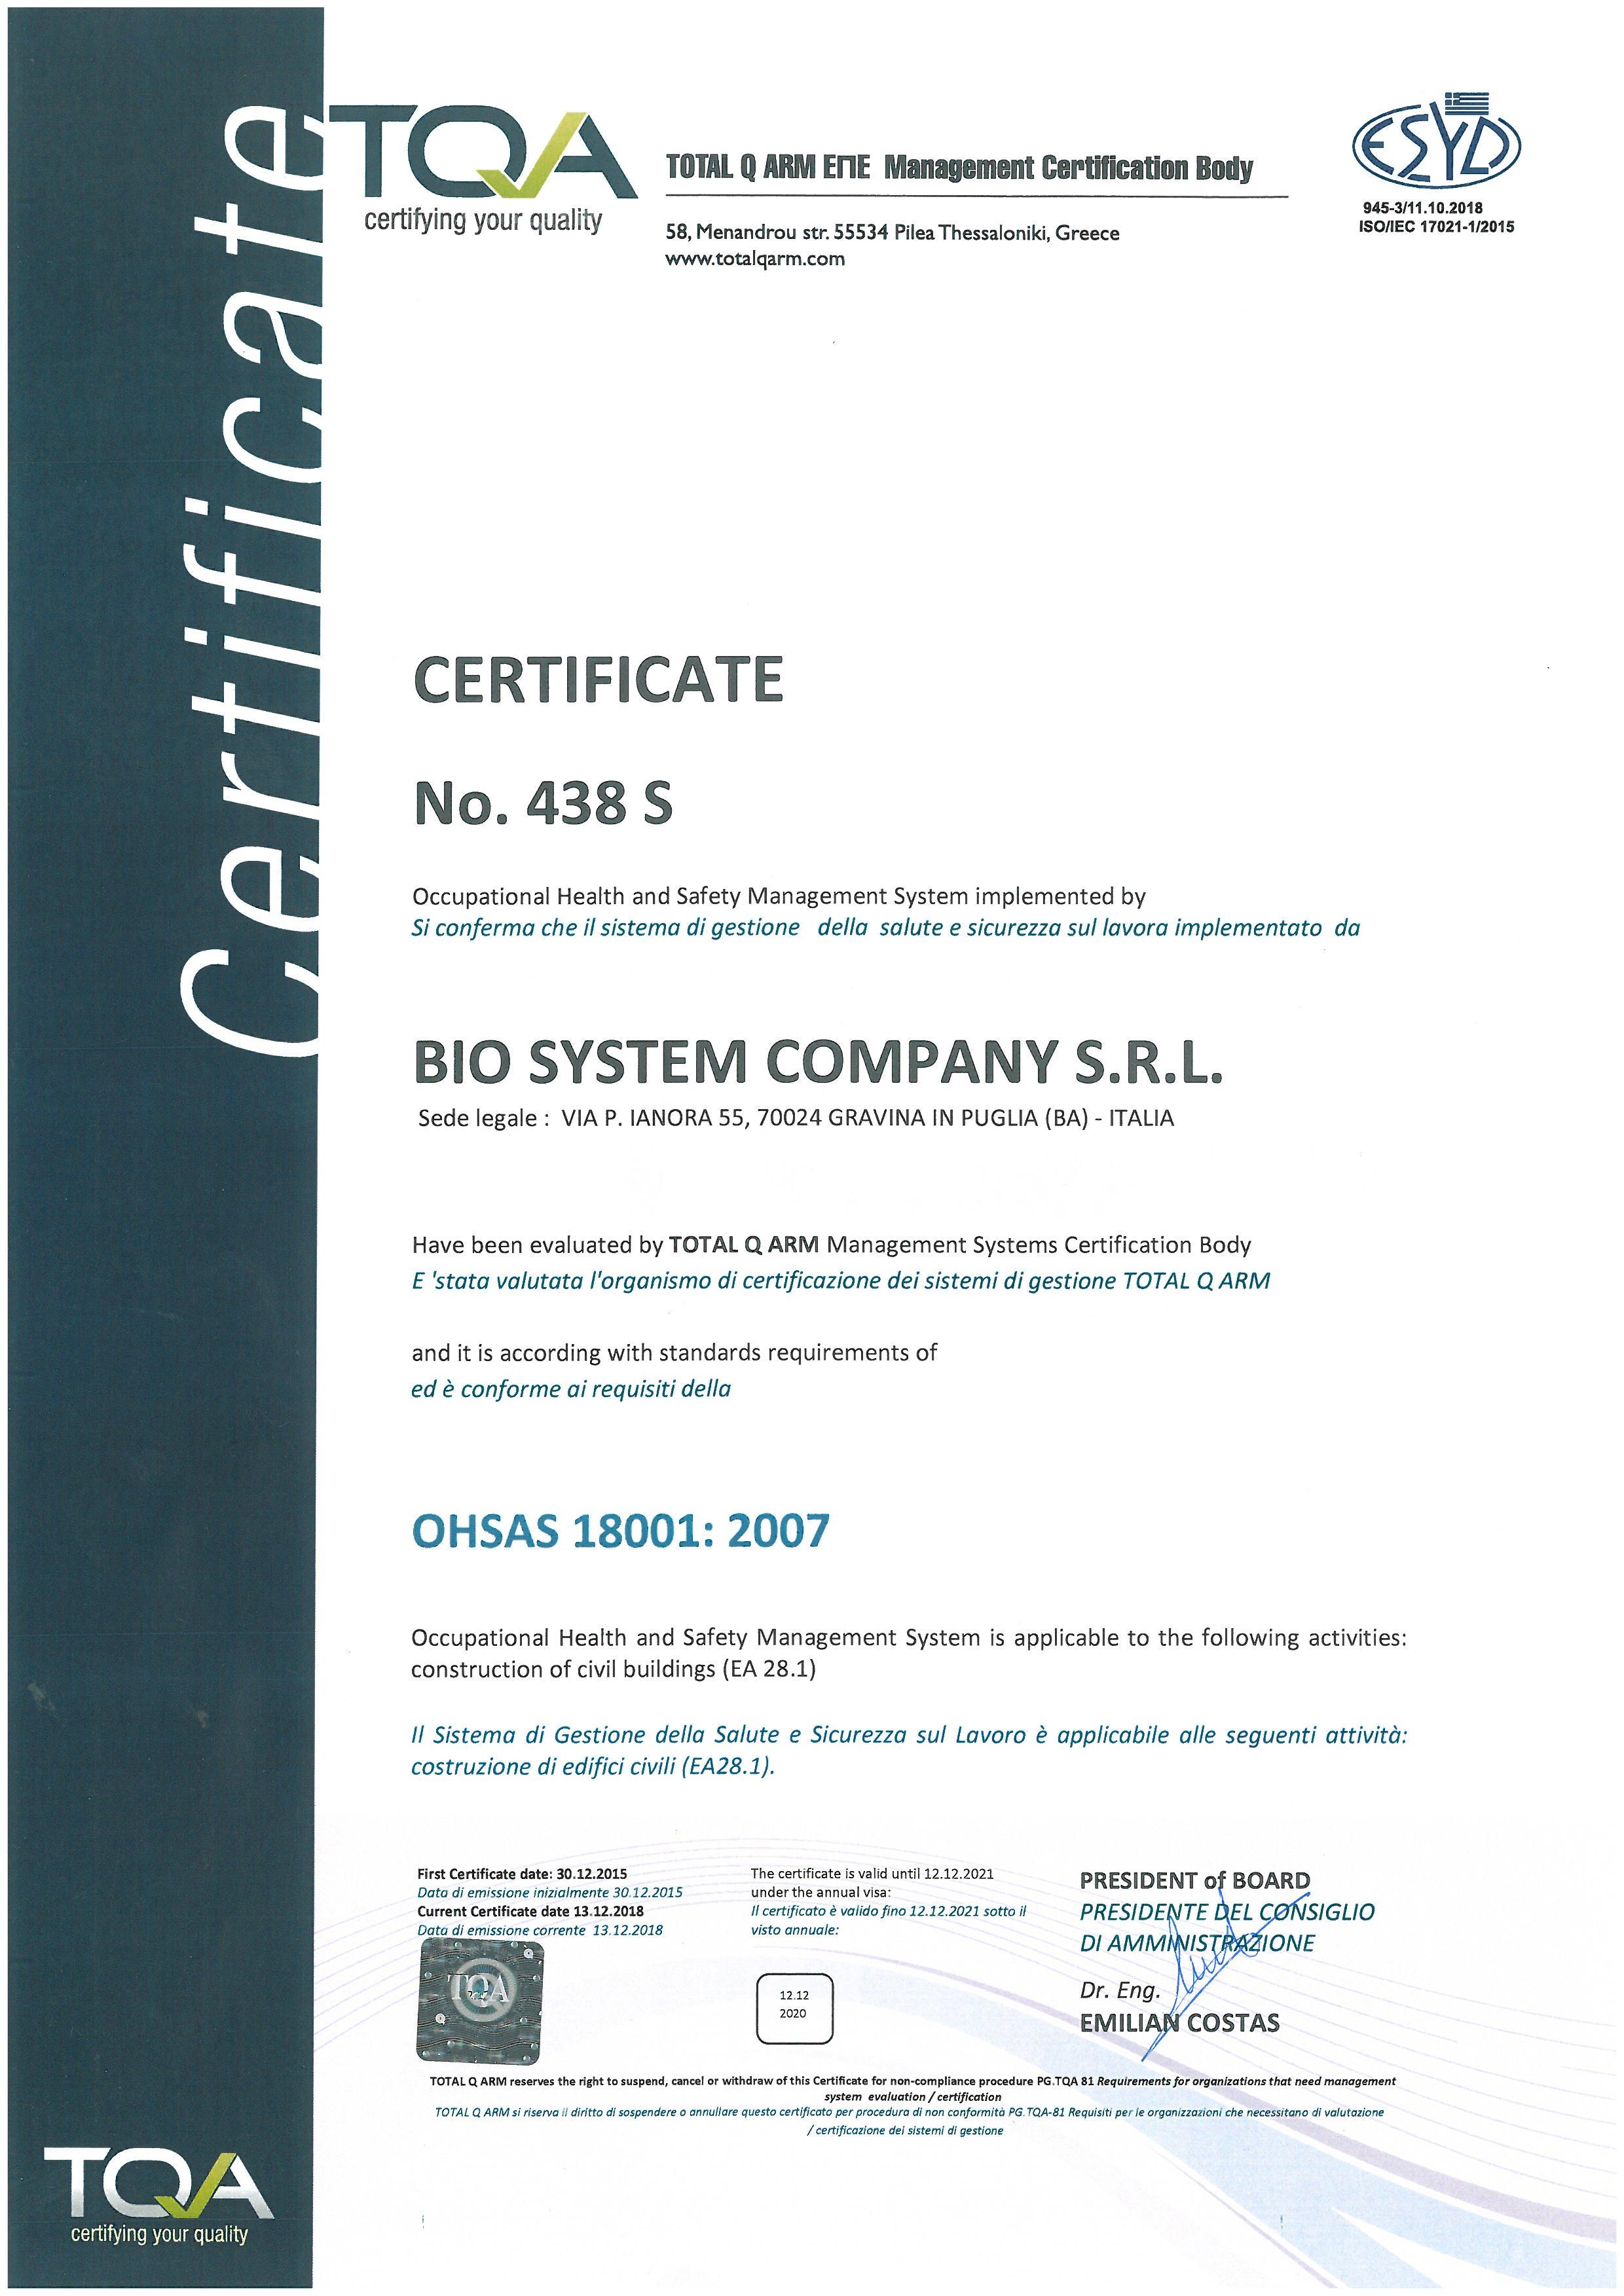 OHSAS 18001 jpeg